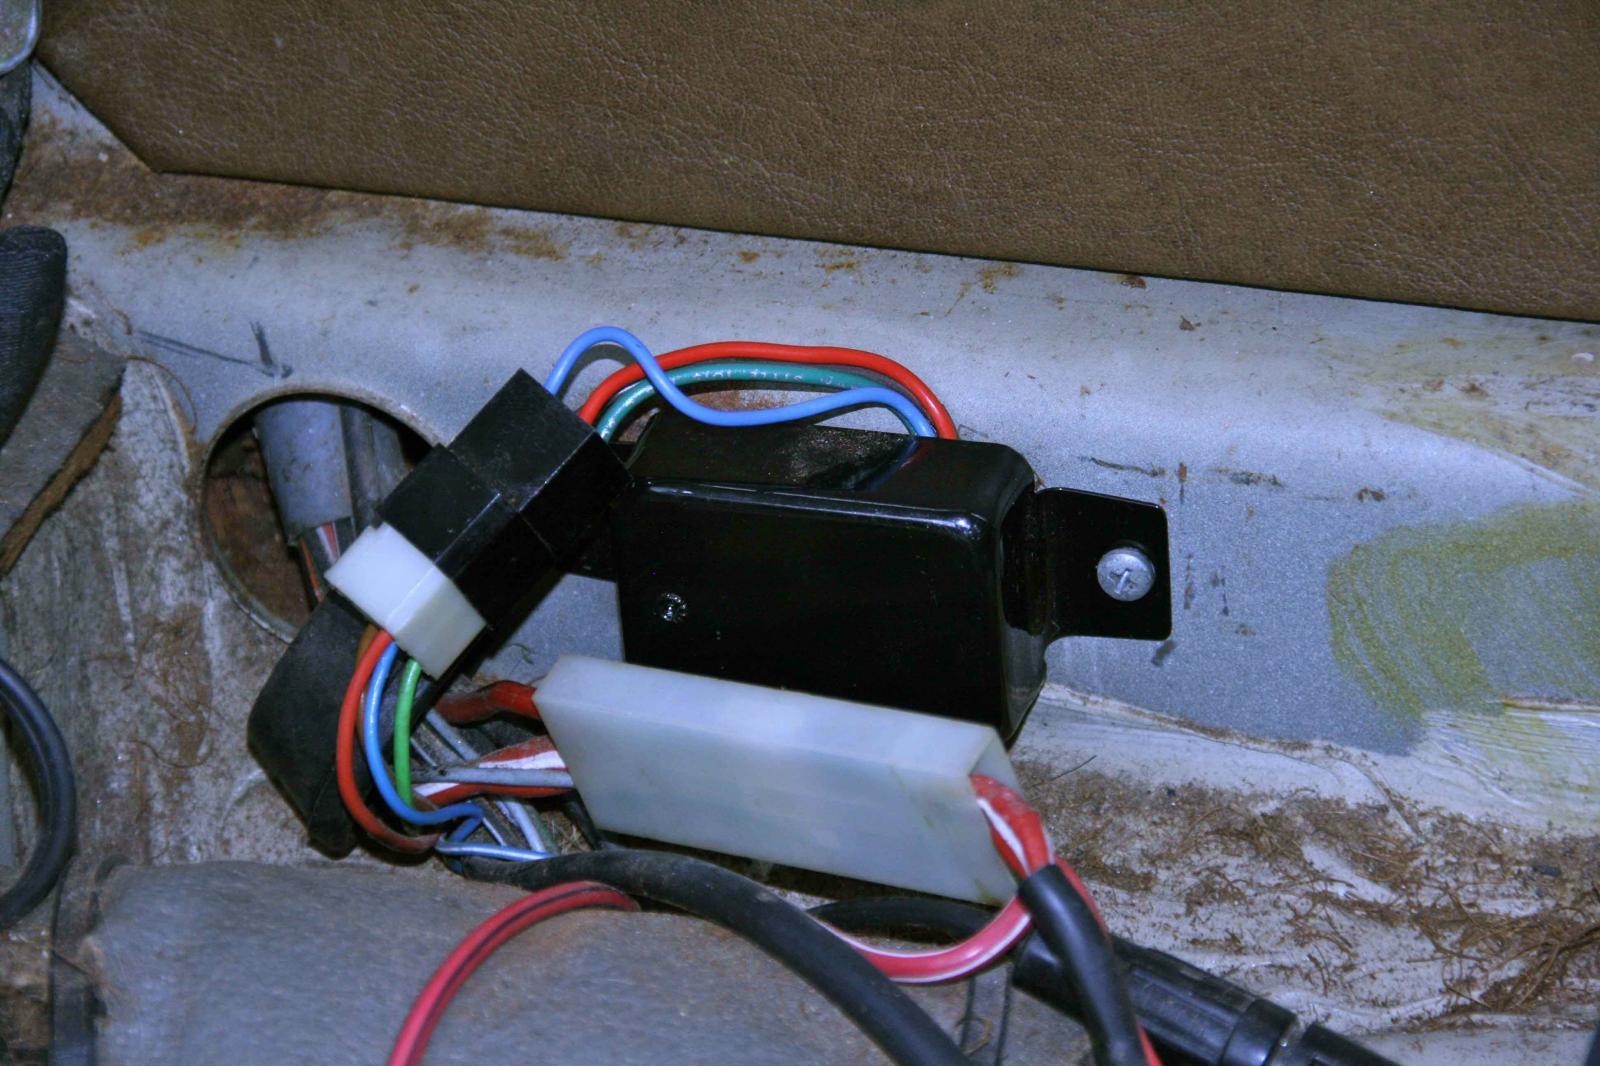 vw bug ghia motorola voltage regulator 73-74 yr 3 prong alternator